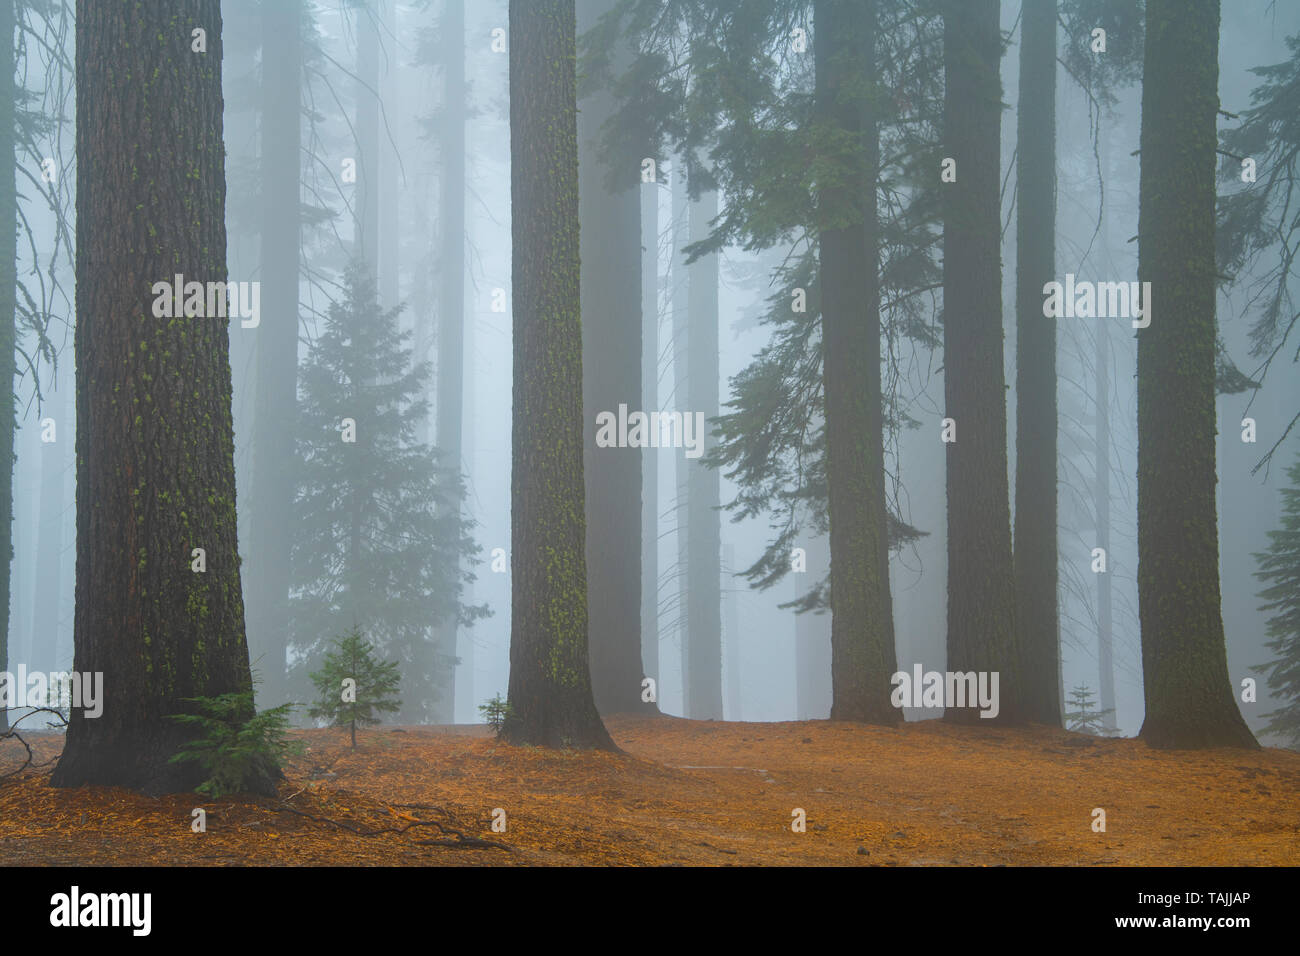 Conifers and morning fog, Mariposa grove, Yosemite NP, California, USA, by Bill Lea/Dembinsky Photo Assoc Stock Photo